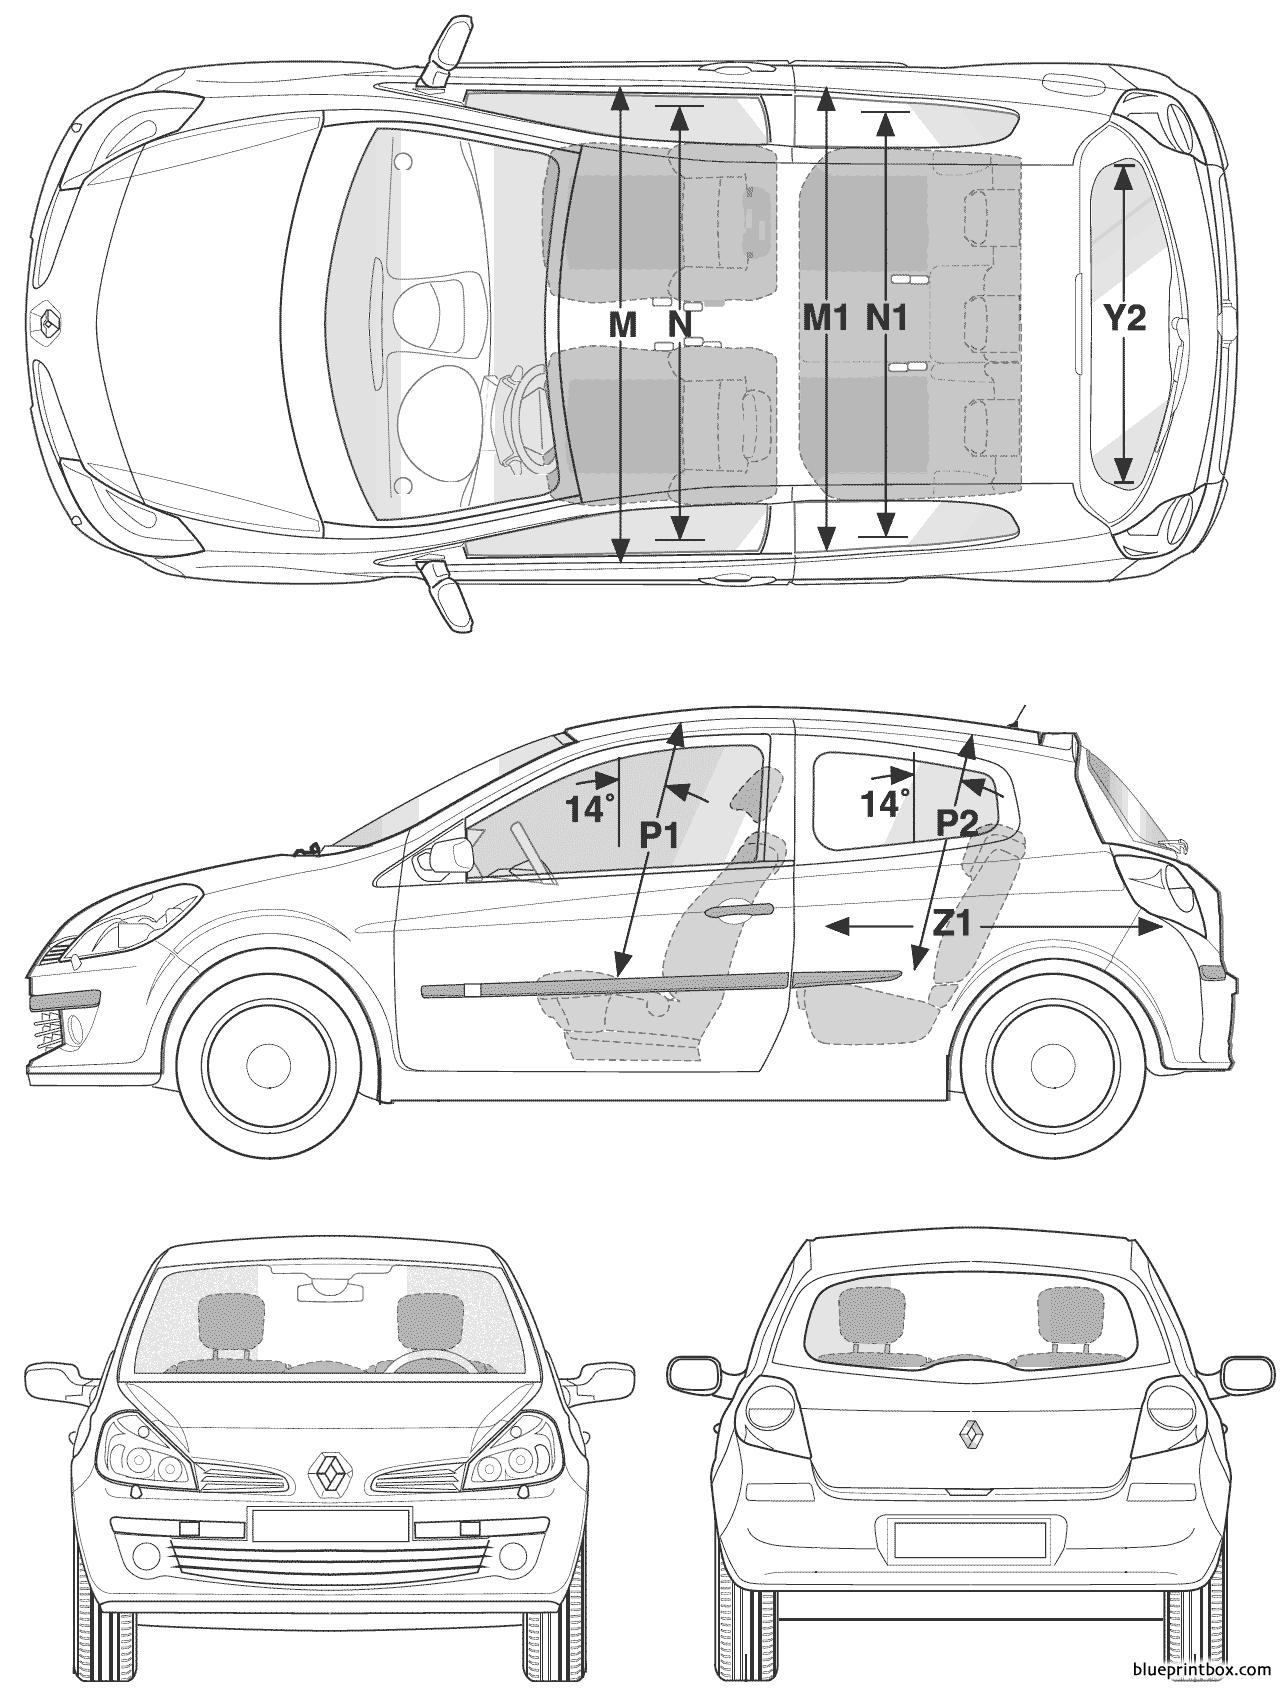 Renault Clio Iii 2006 - Blueprintbox Com